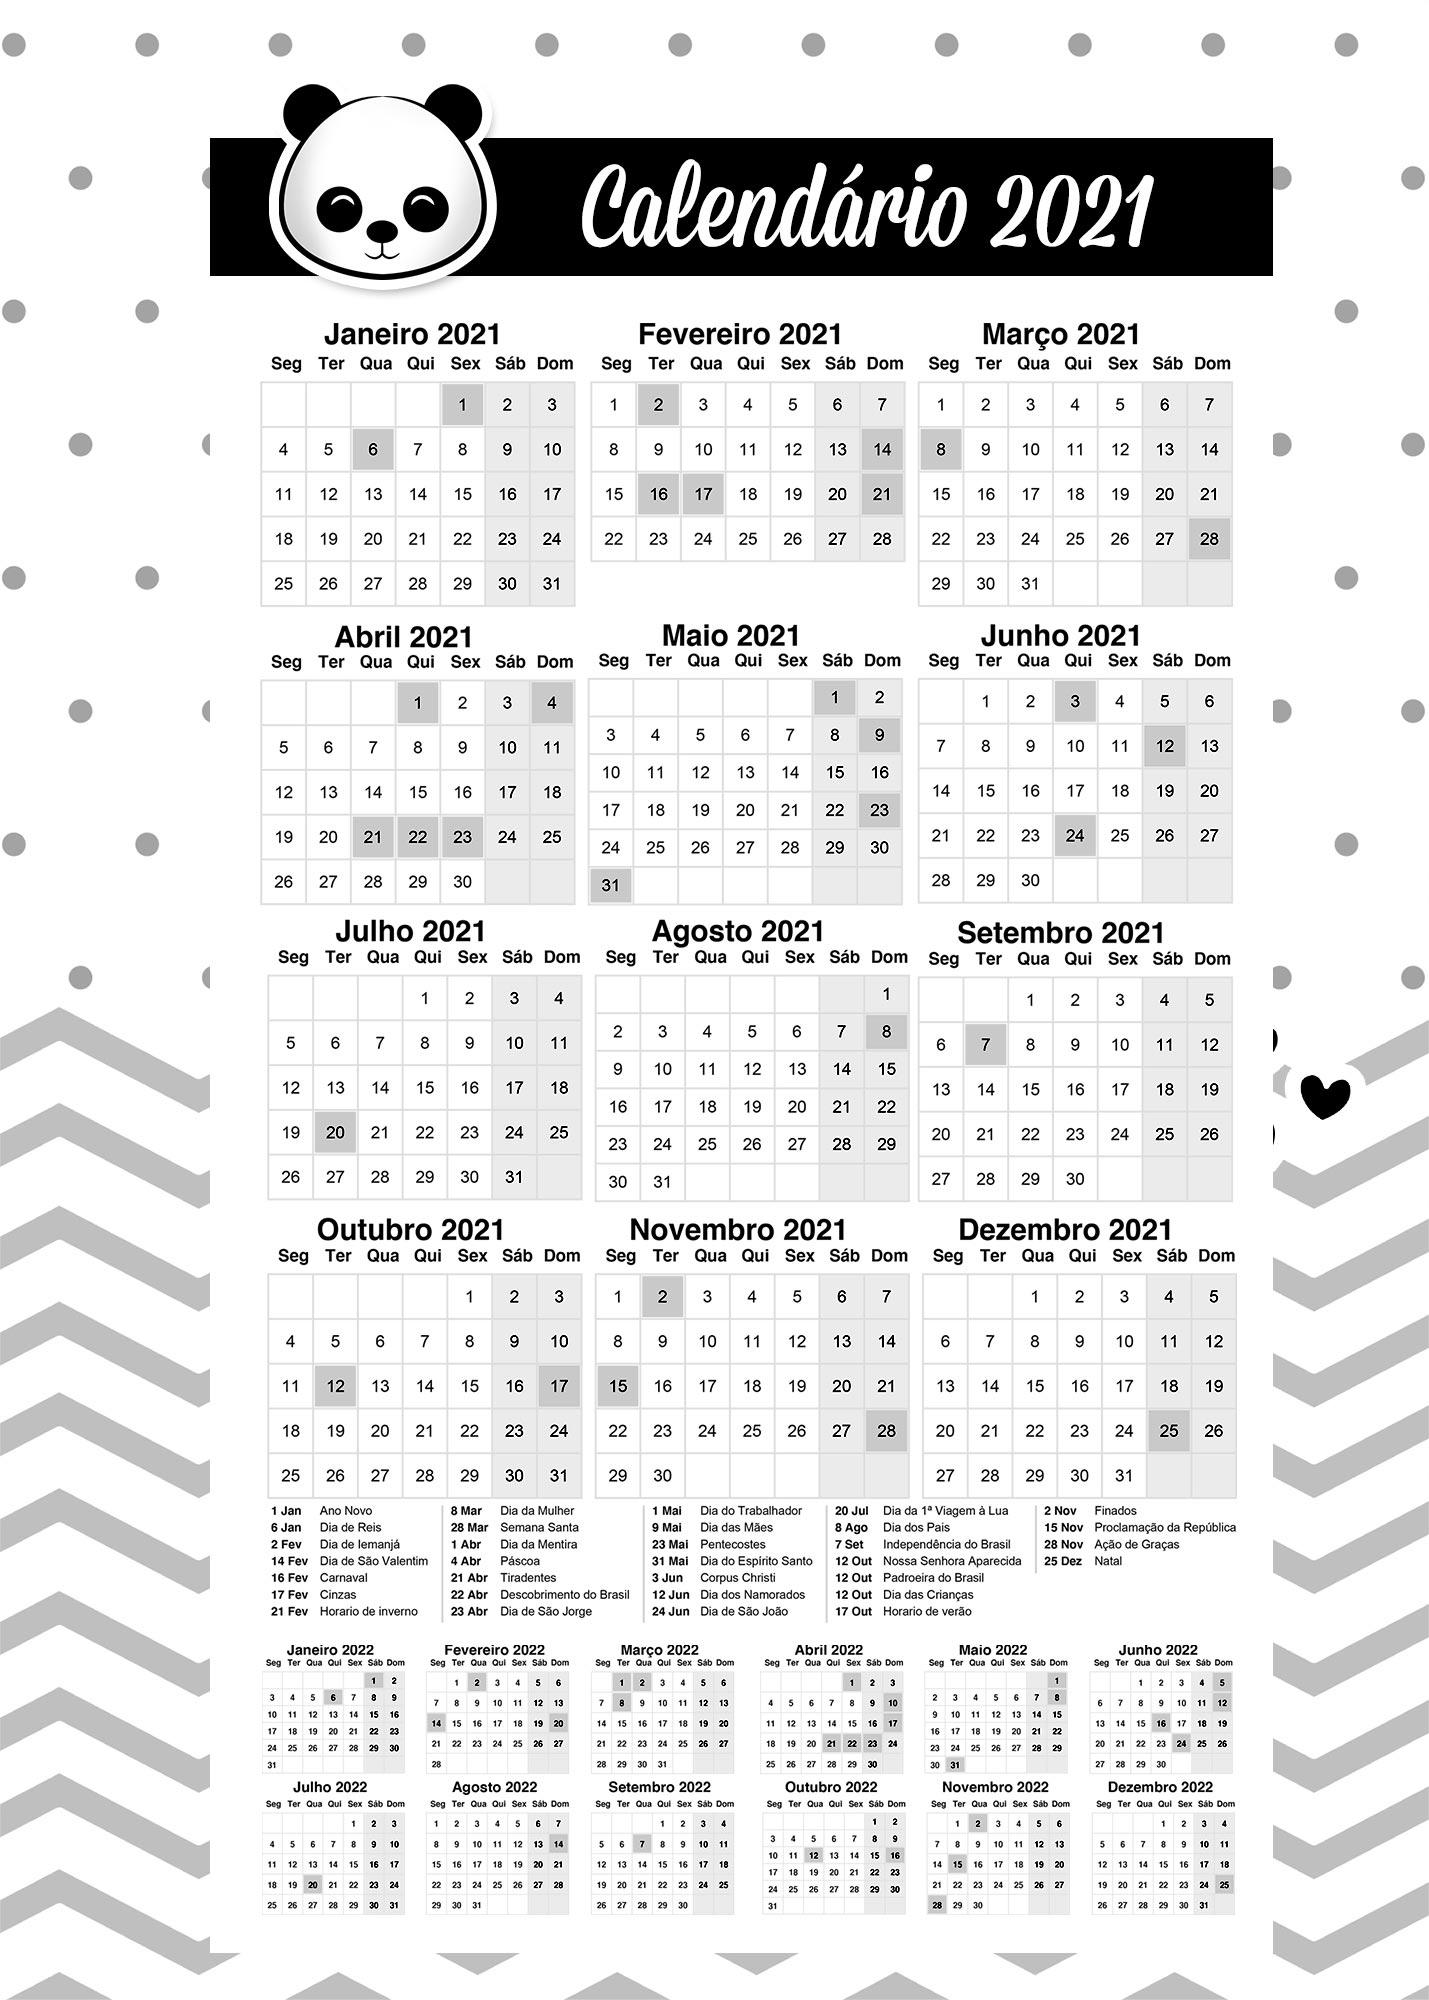 Calendario Professor Panda 2021